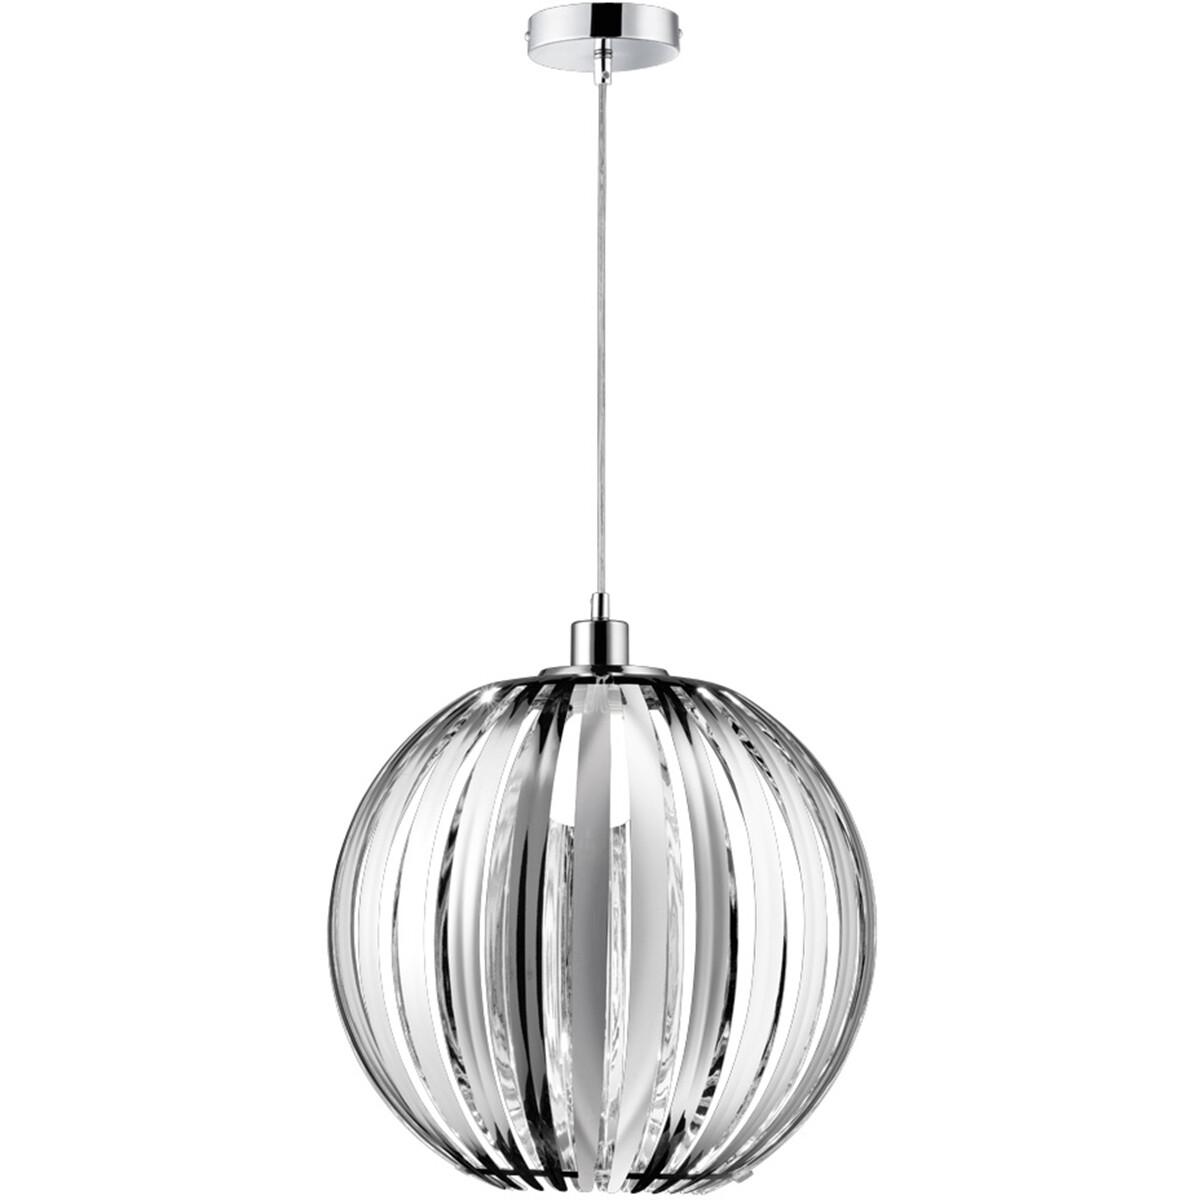 LED Hanglamp - Hangverlichting - Trion Zuka - E27 Fitting - Rond - Glans Chroom - Acryl